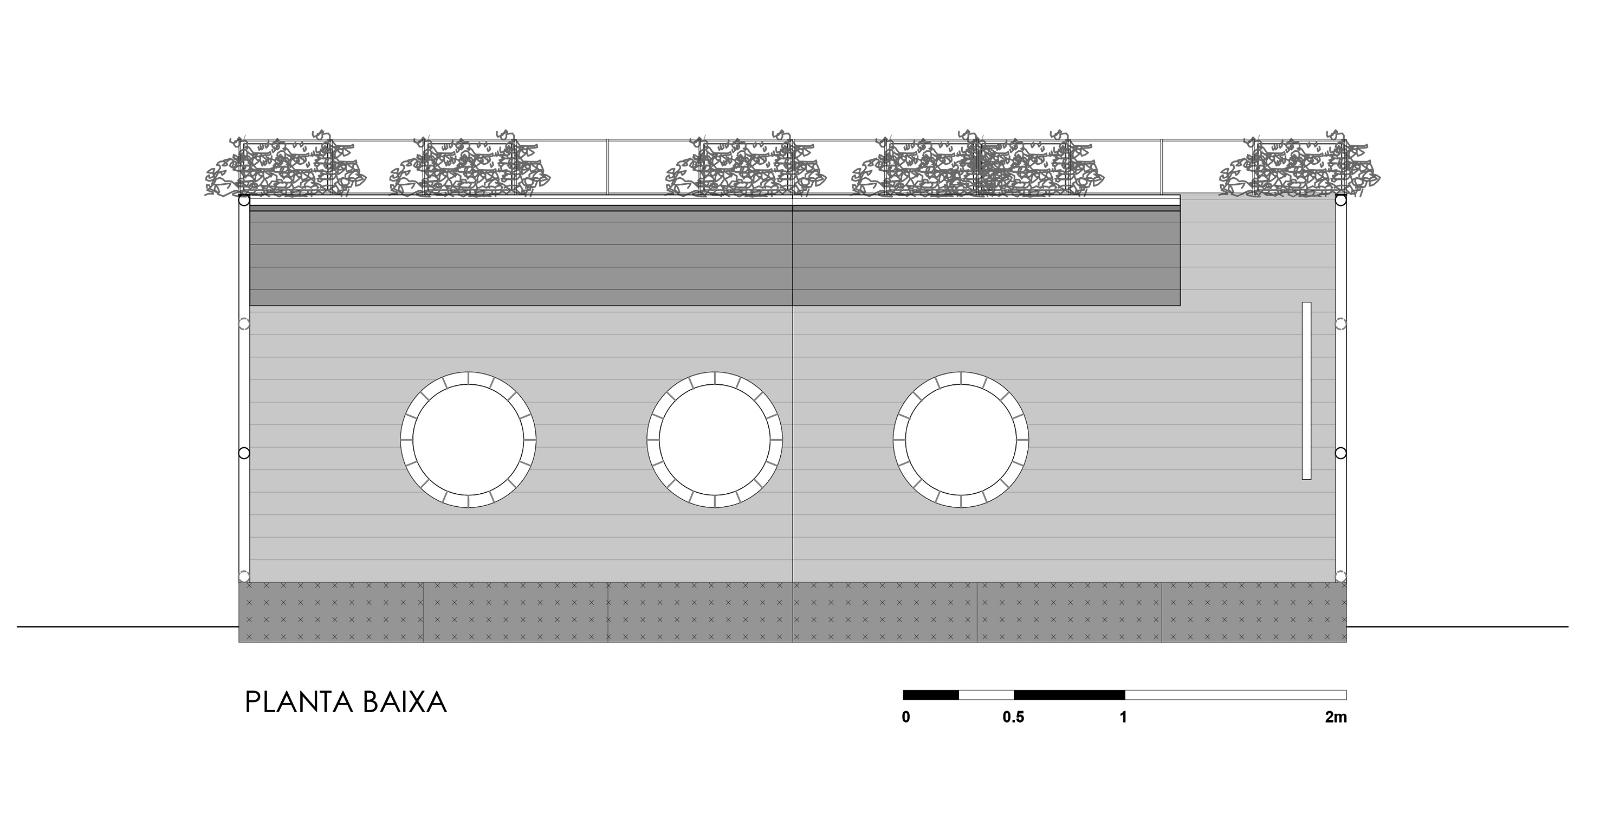 PARKLET TASCA DA ESQUINA - ALAMEDA ITU - PLANTA - HAA (1)